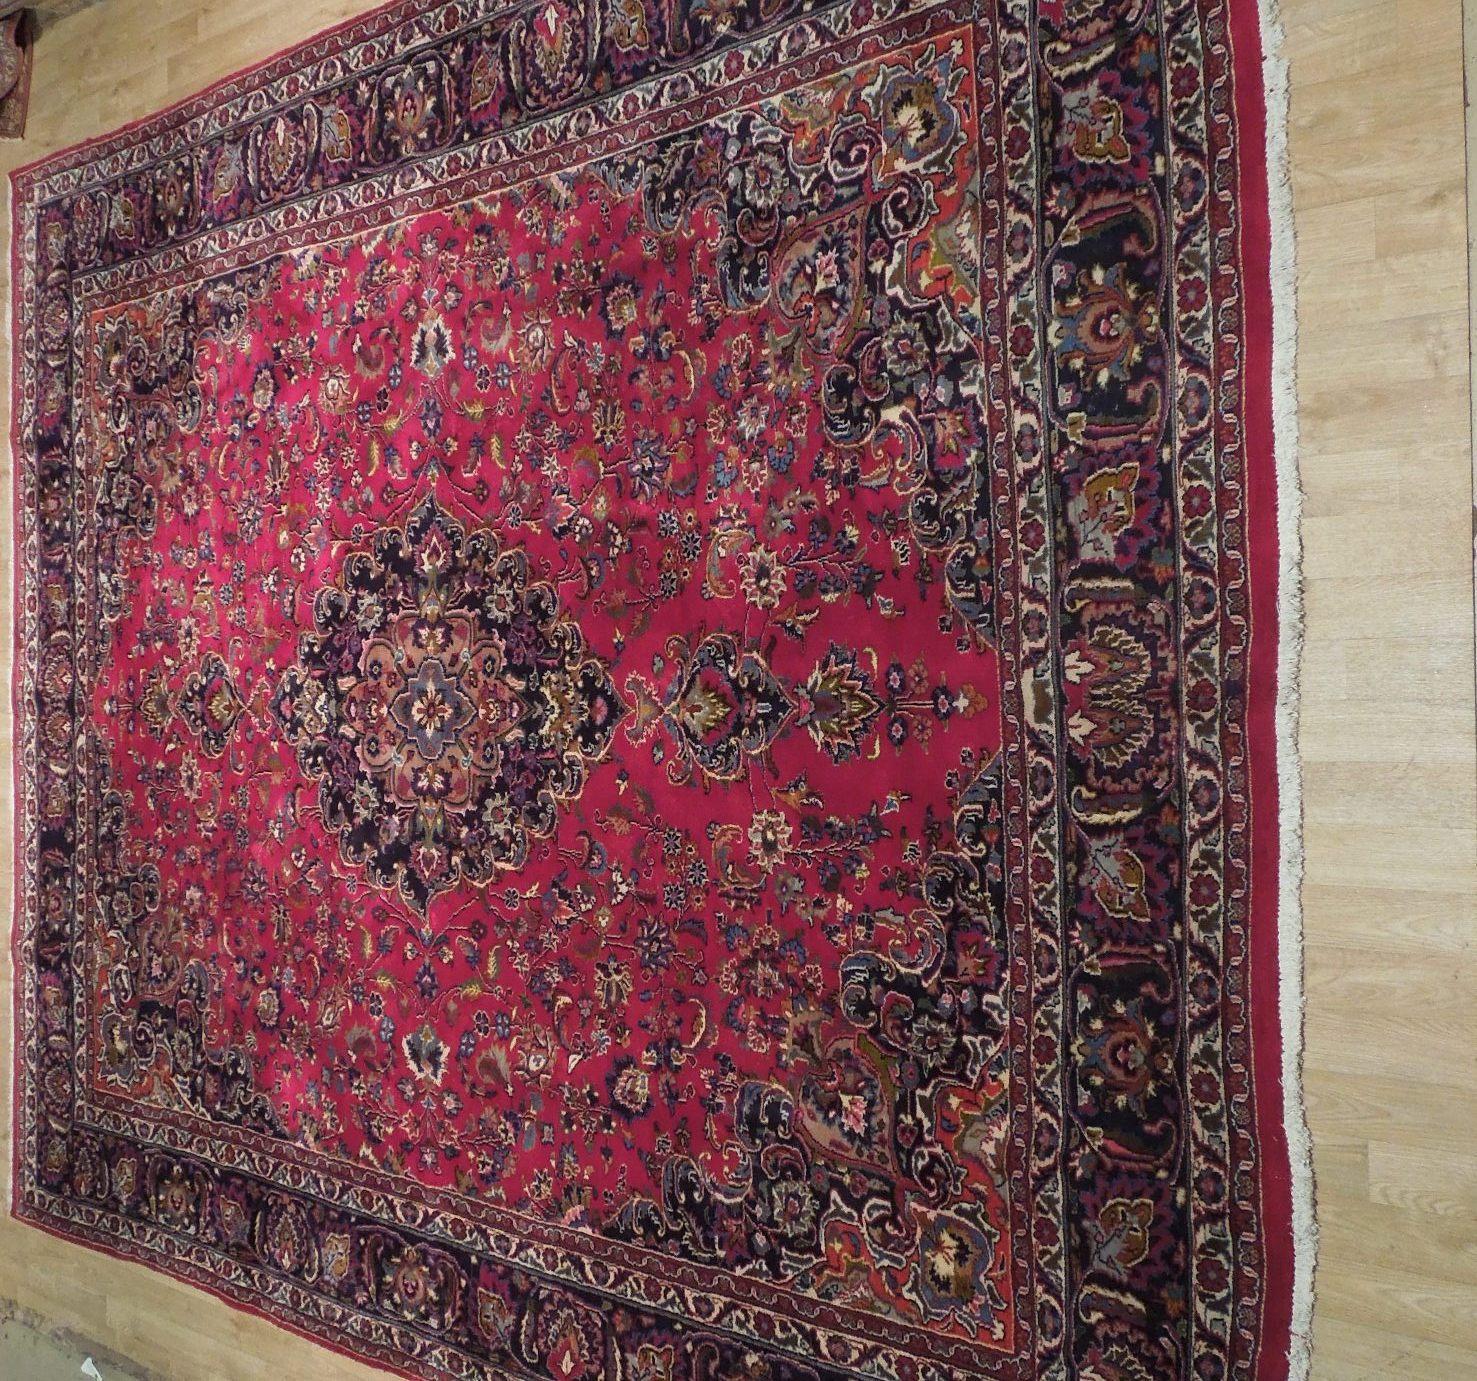 Red Wool Rug 10' x 12' Scarlet Vivid Original Traditional Persian Handmade Rug image 10